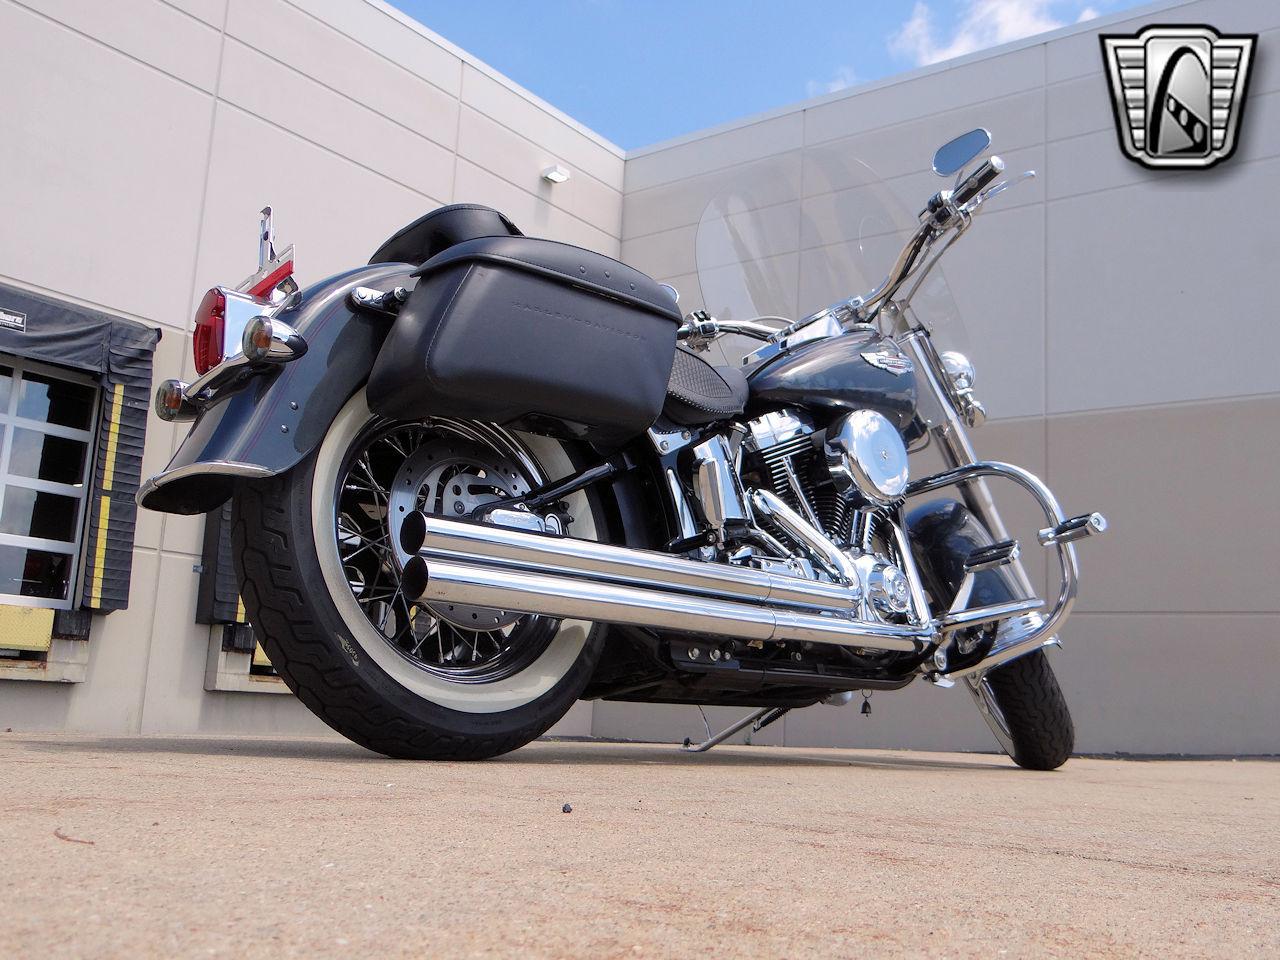 2006 Harley Davidson FLSTNI 34